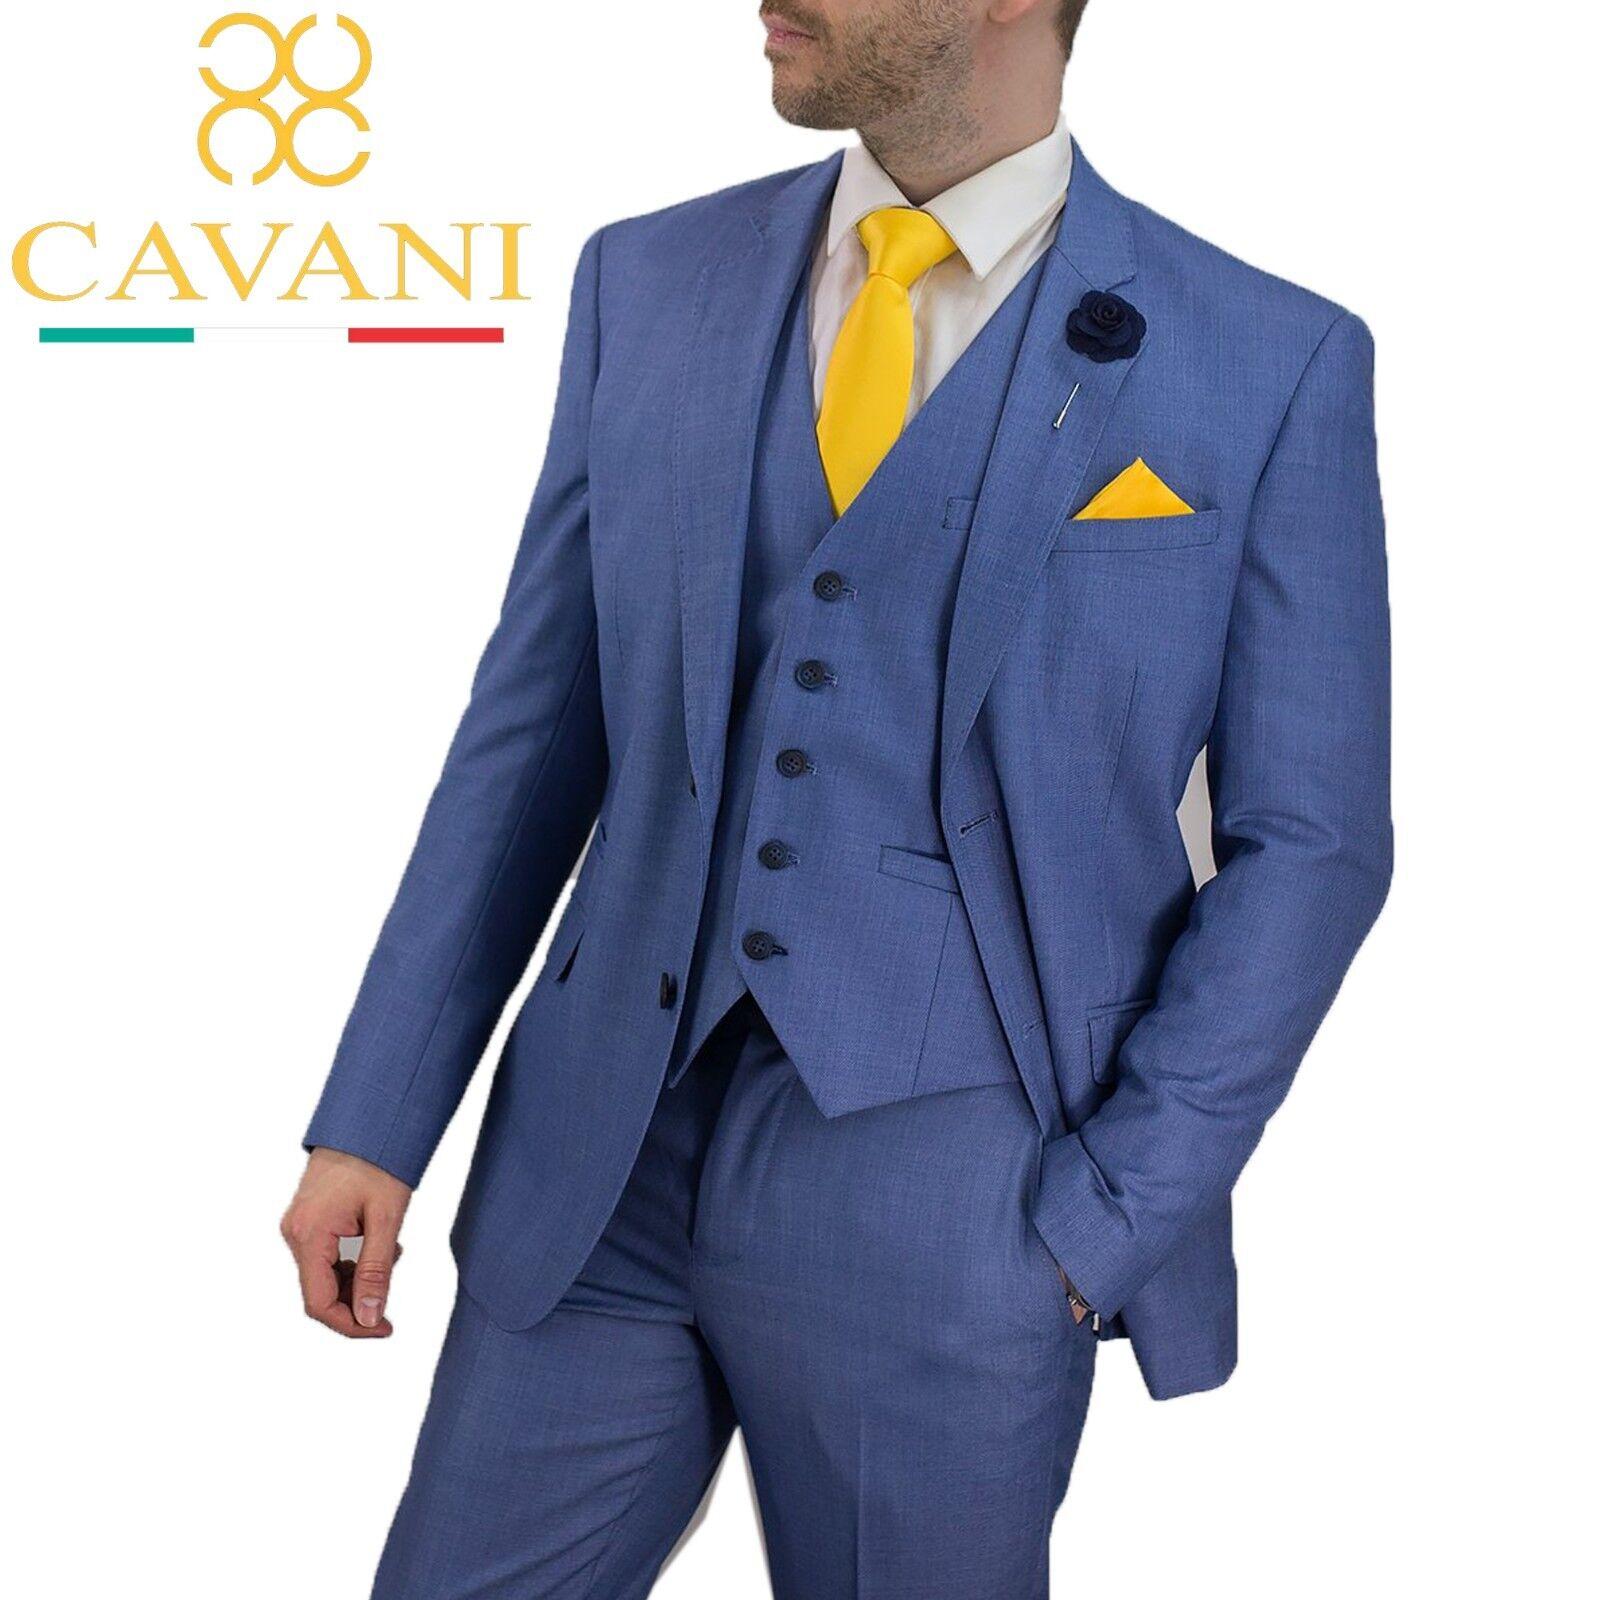 Herren Cavani Designer Summer Wedding Light Blau 3 Piece Suit Sold Separately New